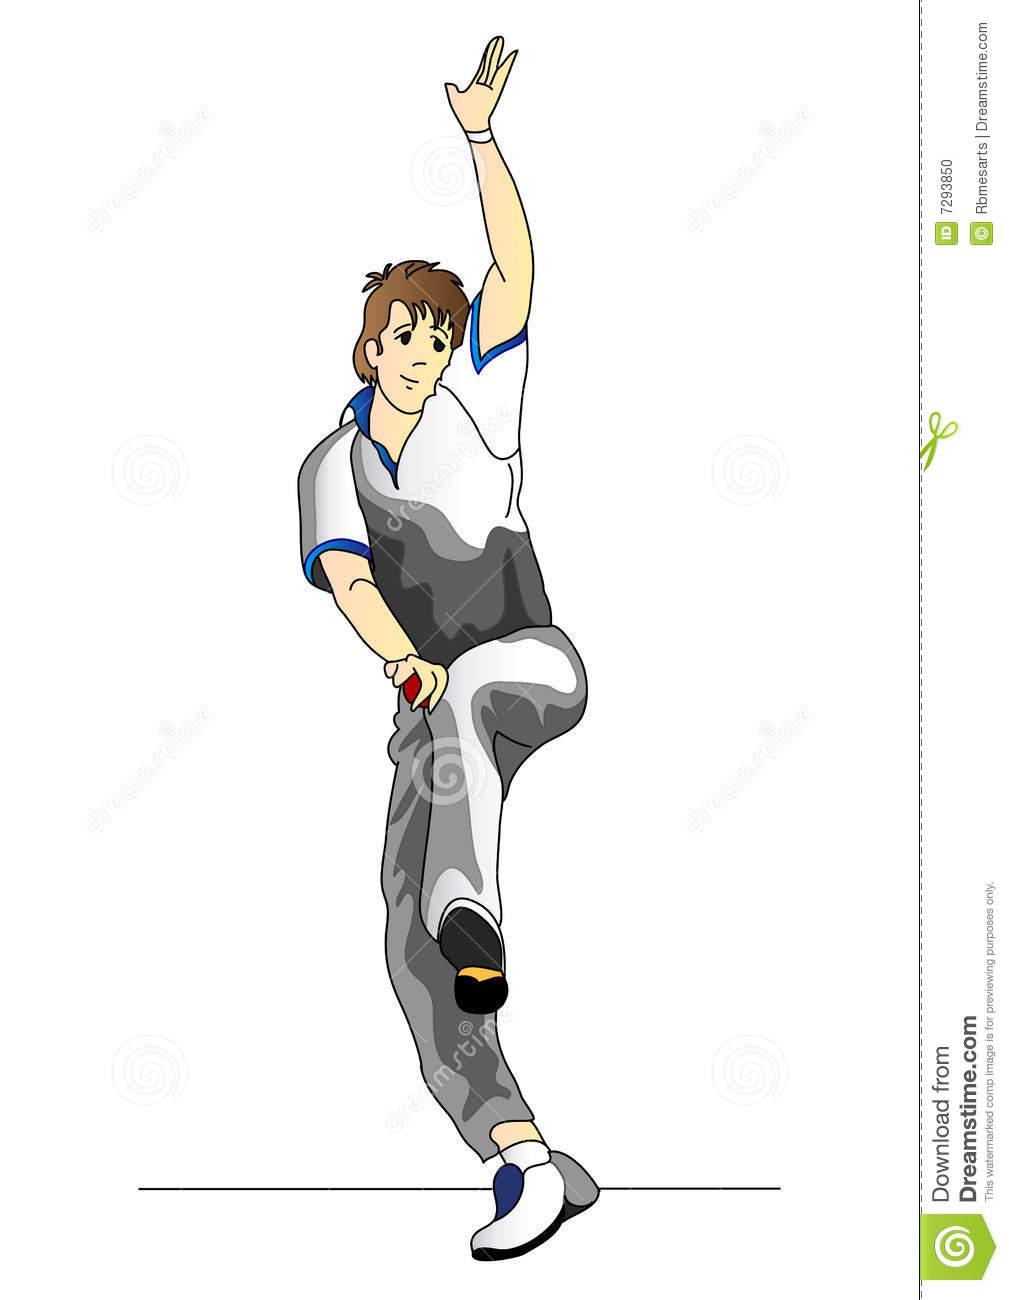 Cricket bowler clipart banner freeuse download Cricket bowler clipart 9 » Clipart Station banner freeuse download